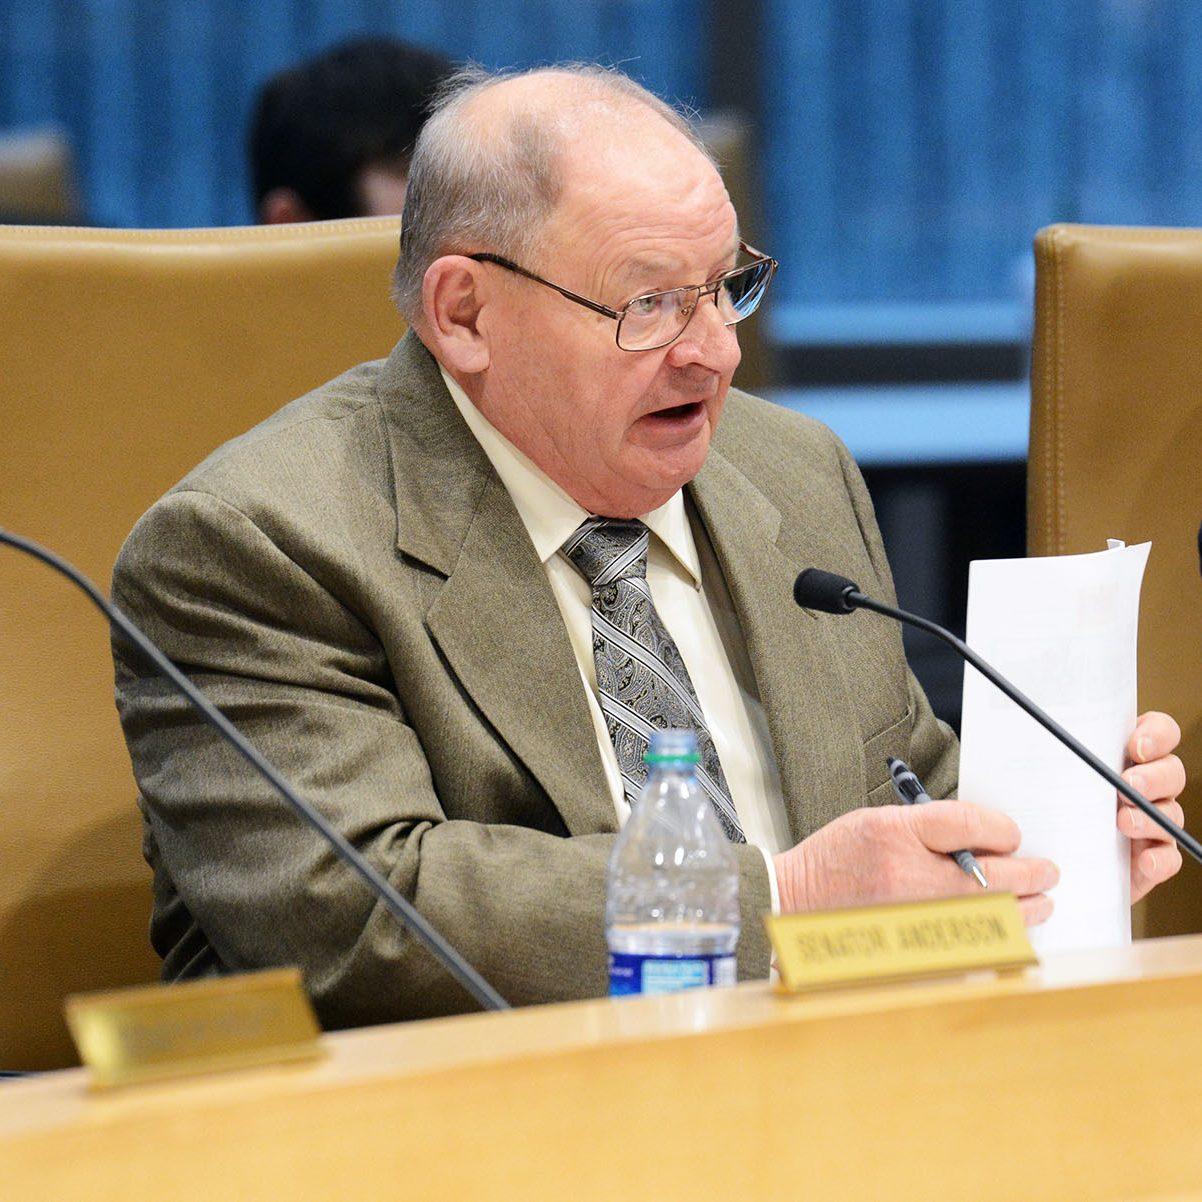 Sen. Dahms listens to committee testimony